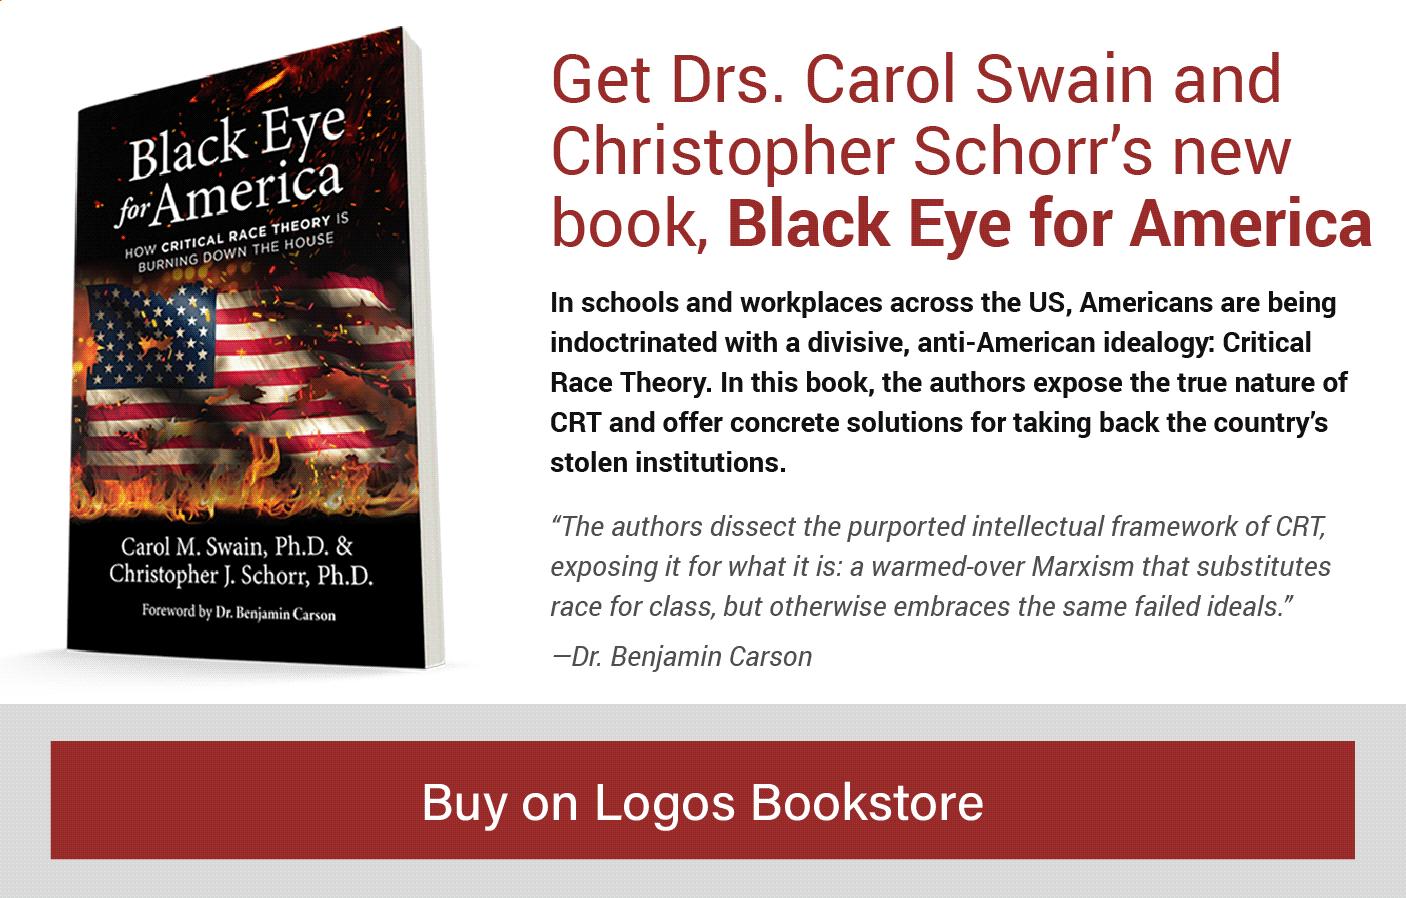 Buy Black Eye for America on Logos bookstore popup